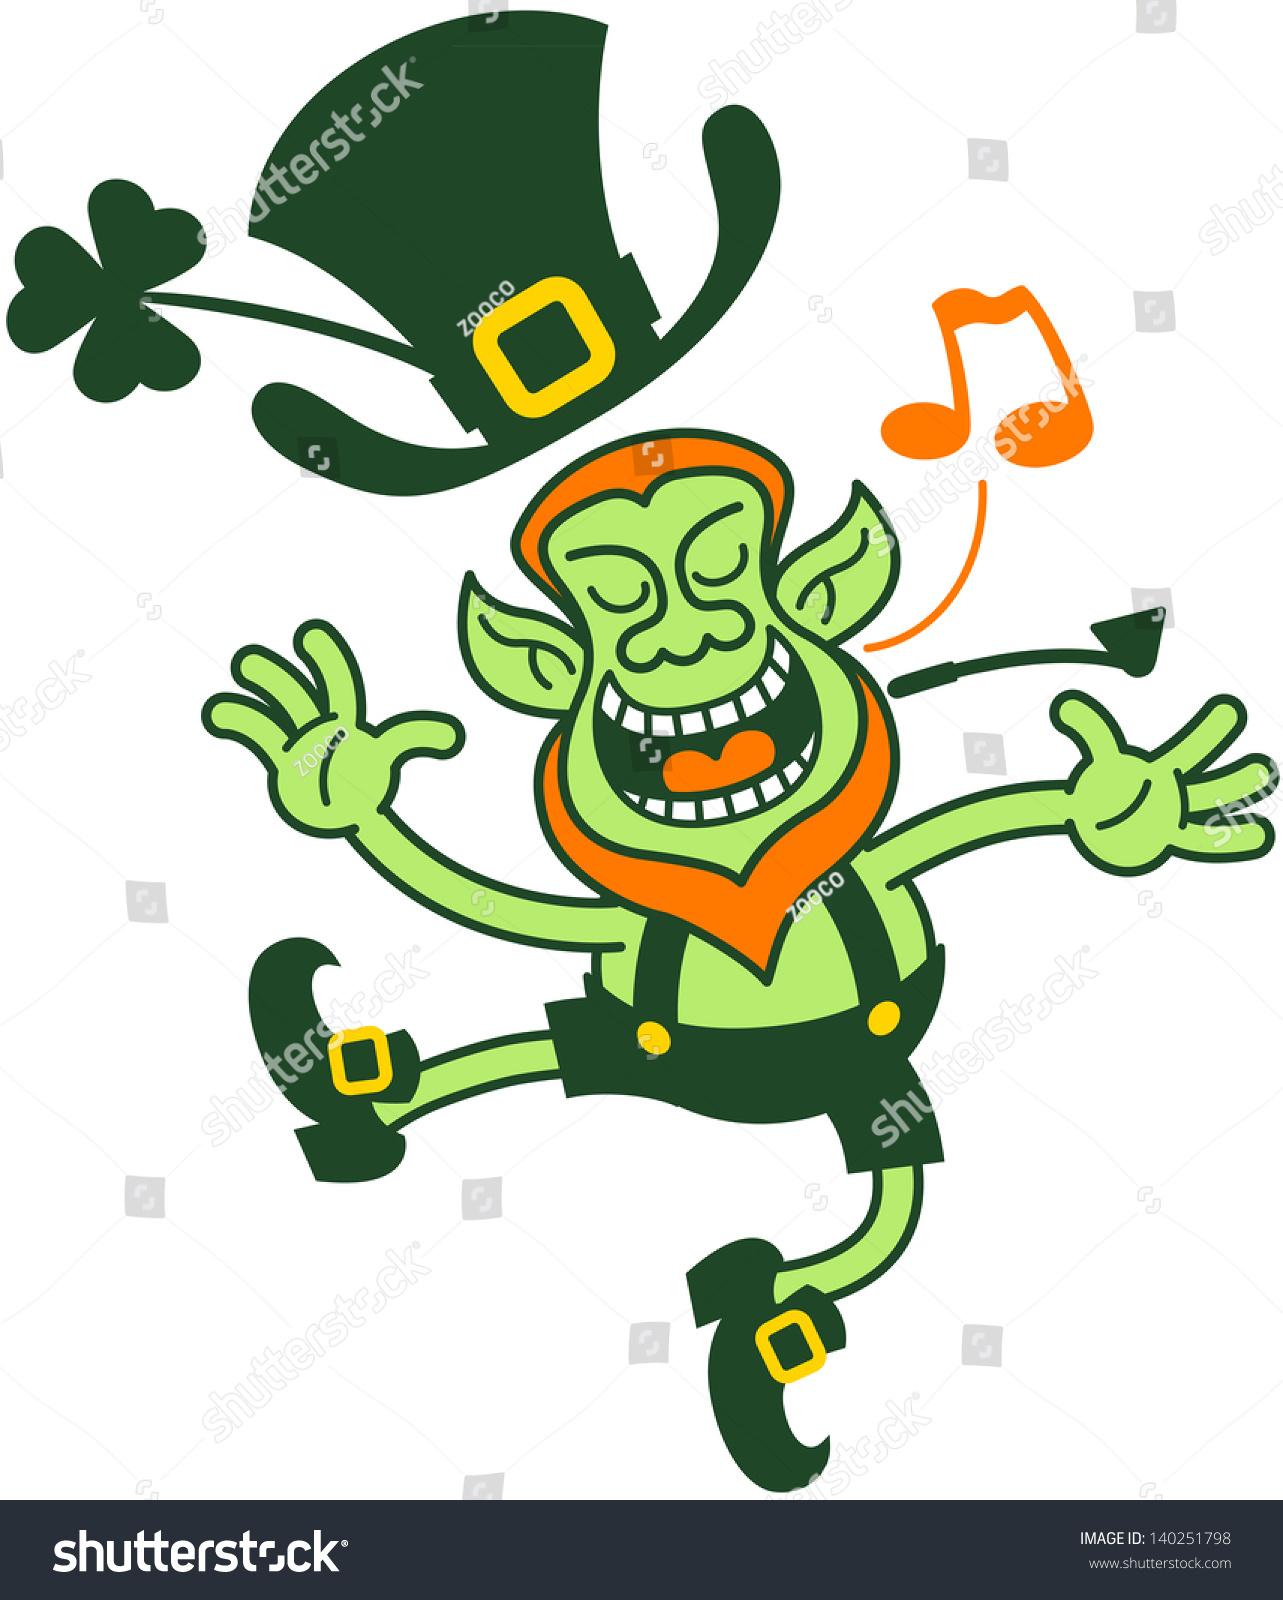 Uncategorized Animated Leprechaun saint patricks day leprechaun singing dancing stock vector and in an animated proud way